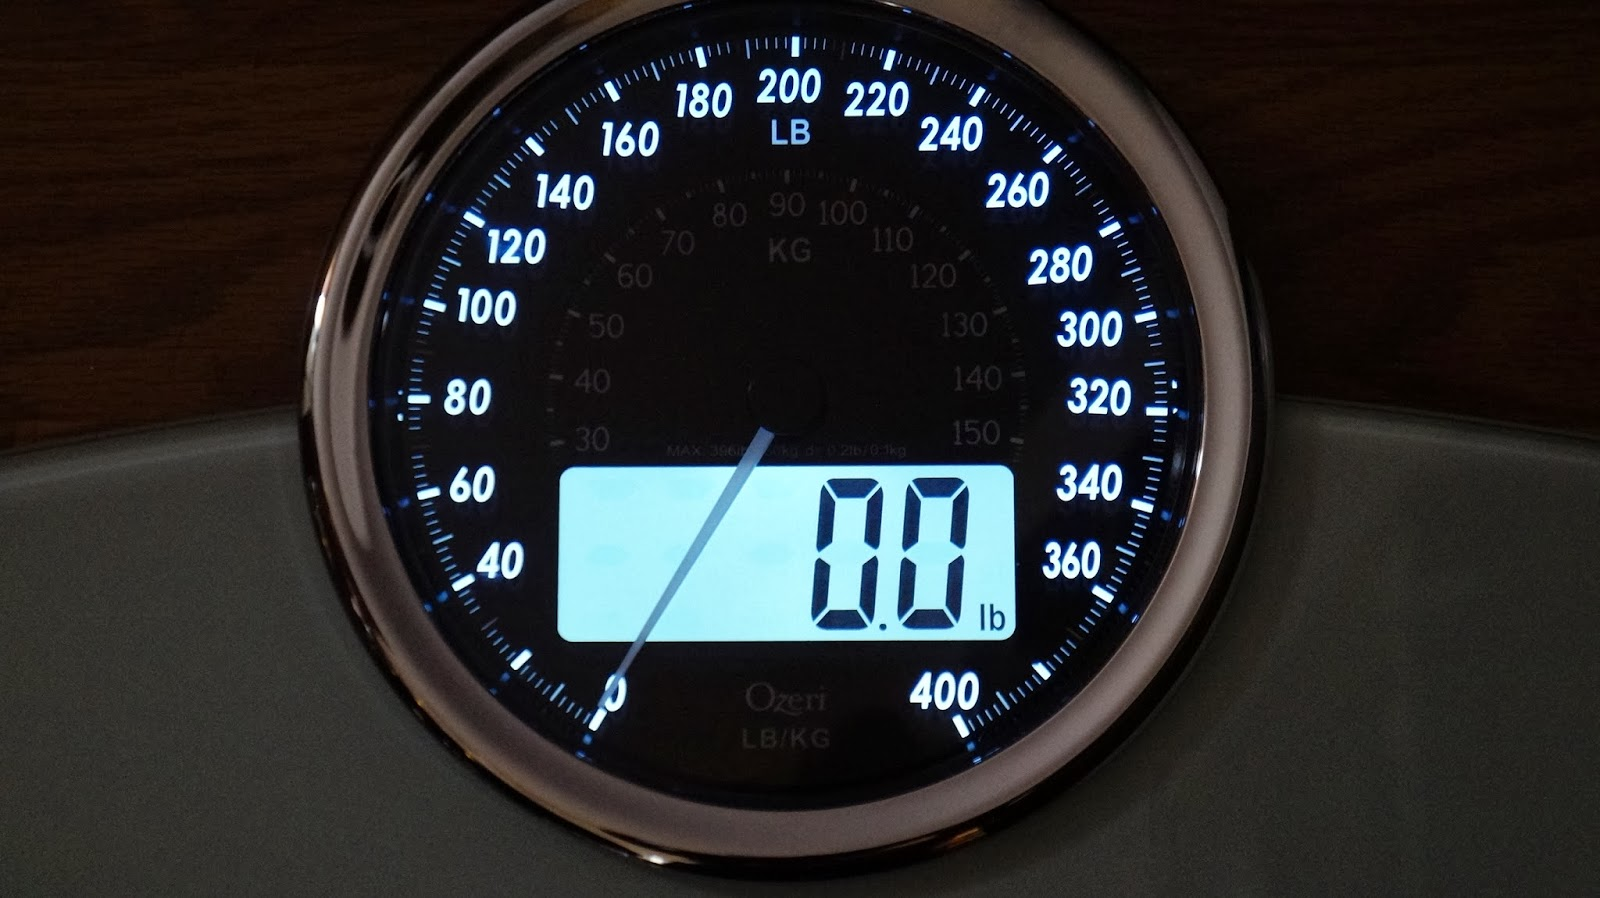 Ozeri Rev Digital Bathroom Scale with light up display